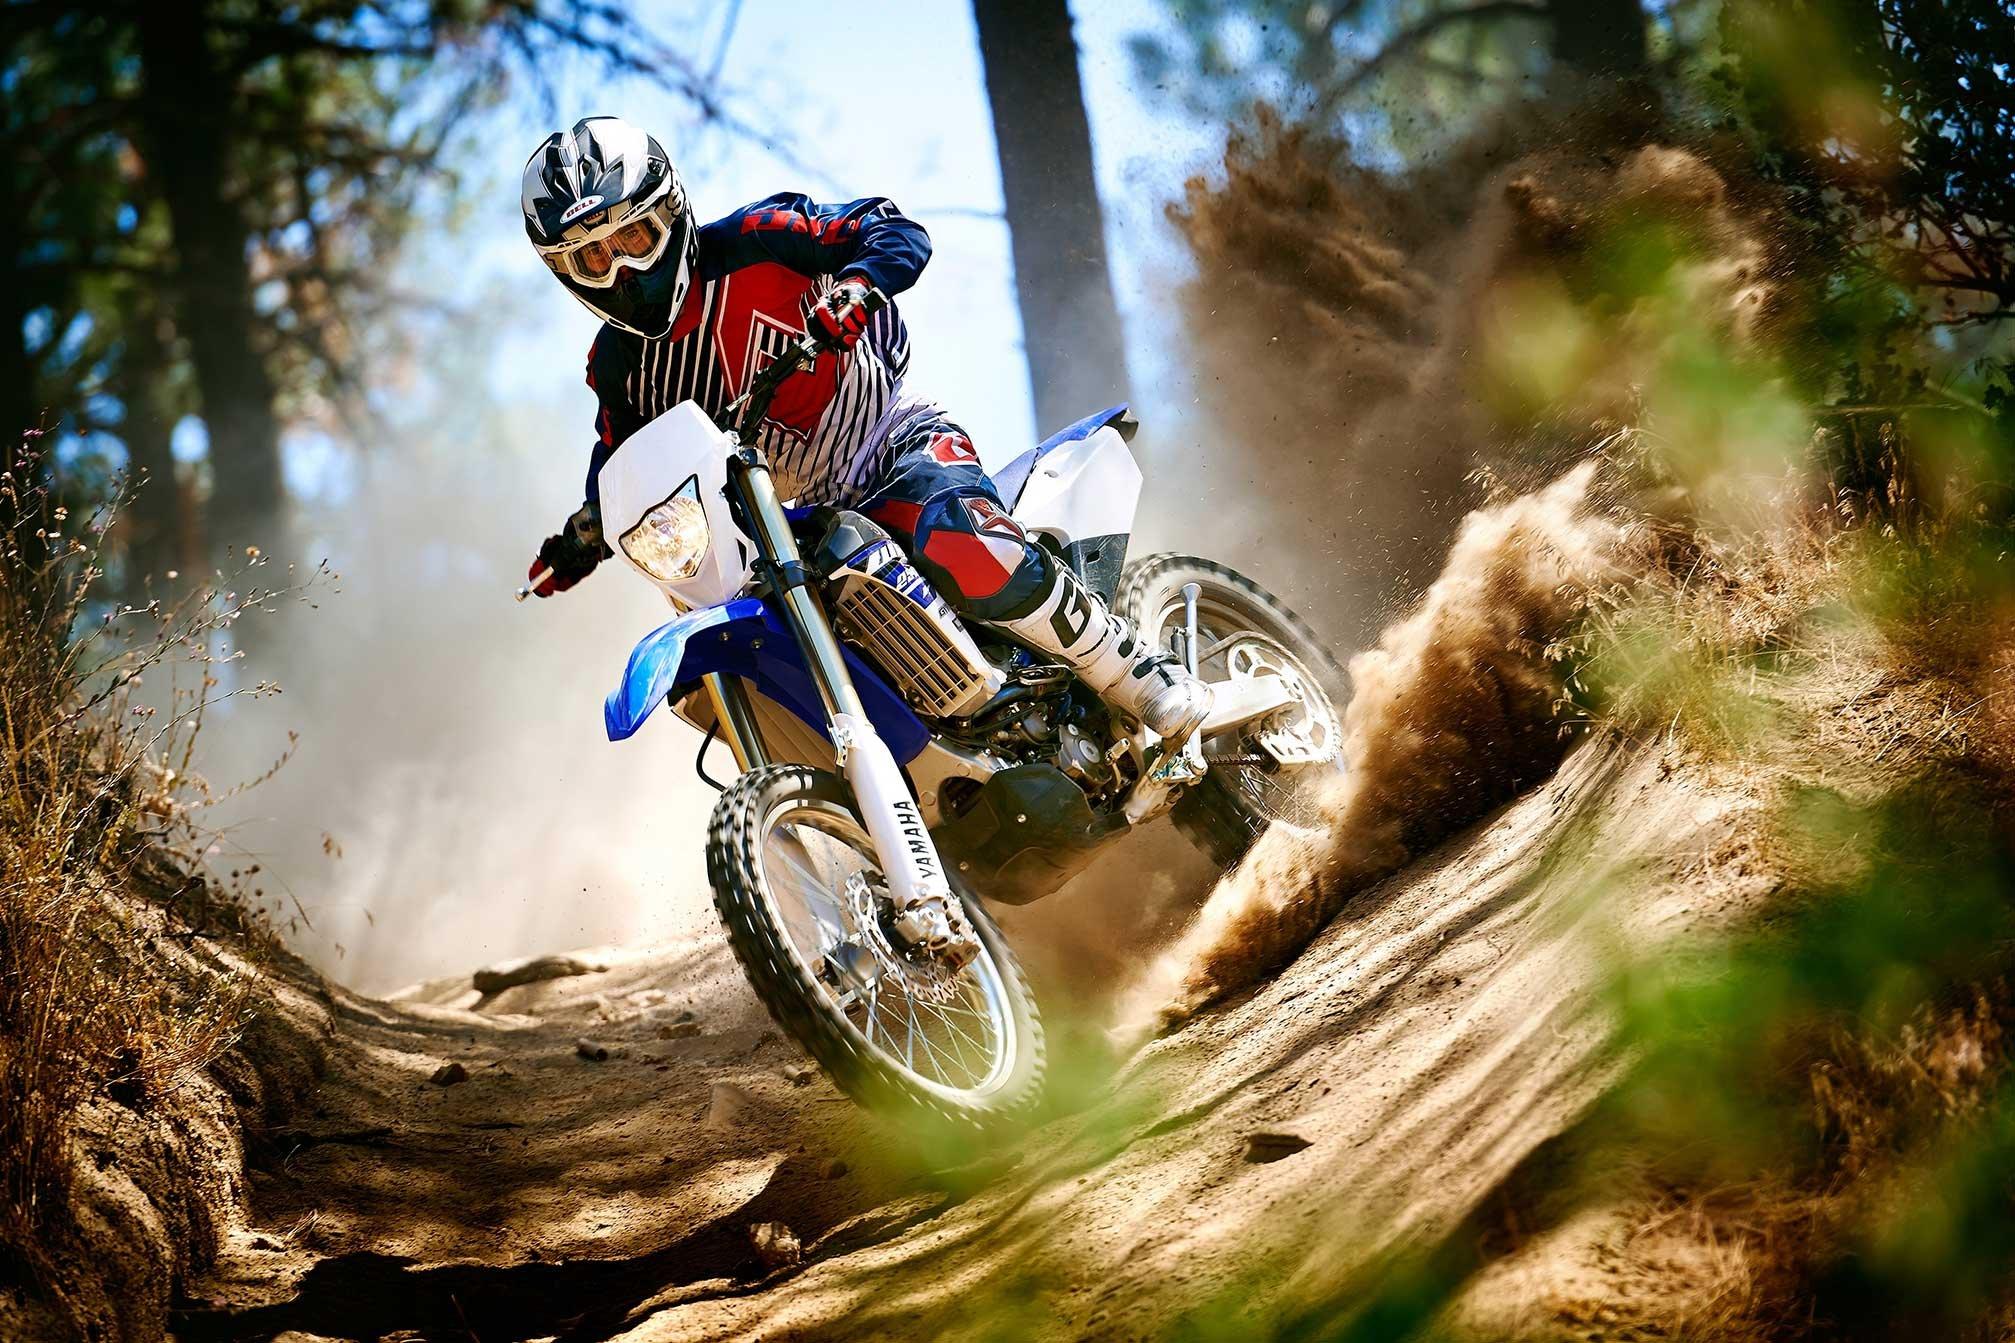 2015 Yamaha WR250F motocross dirtbike moto wallpaper 2015x1343 2015x1343